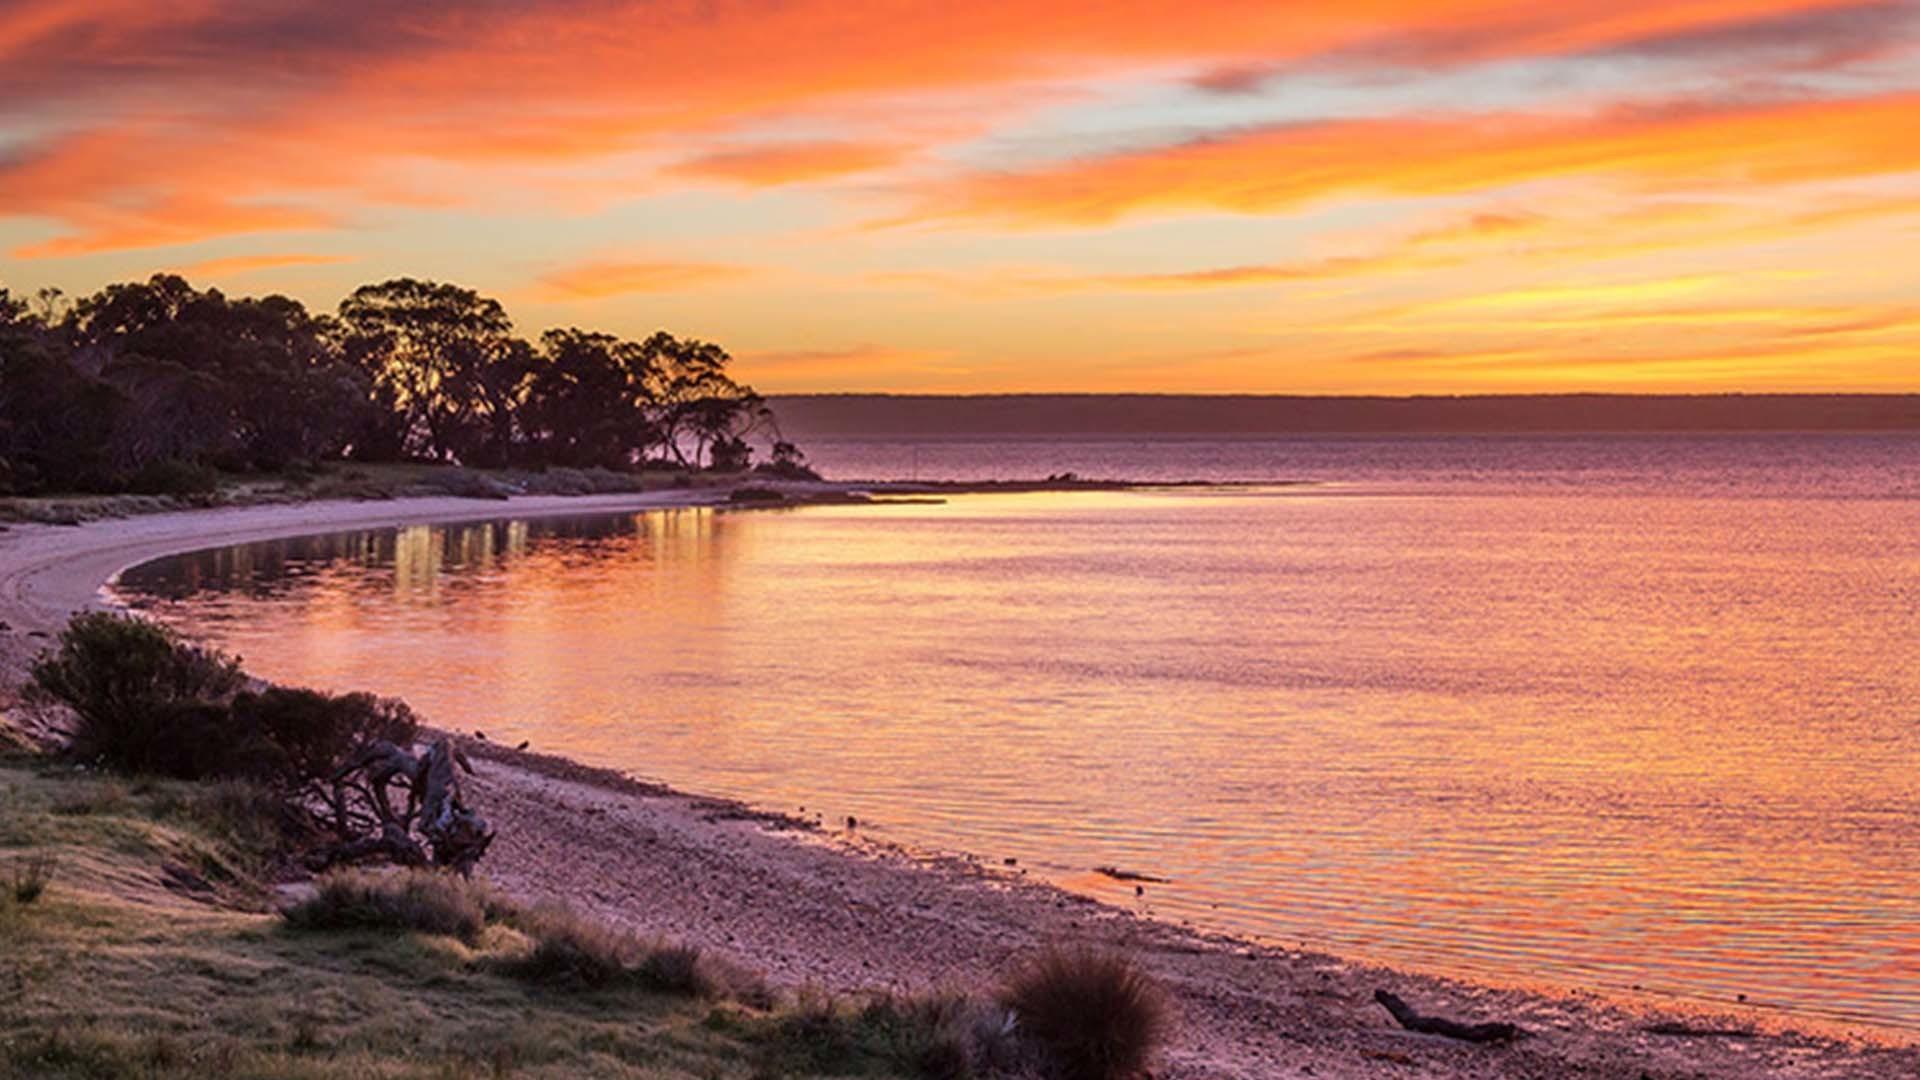 Mercure kangaroo island lodge one sealink Sunset lodge